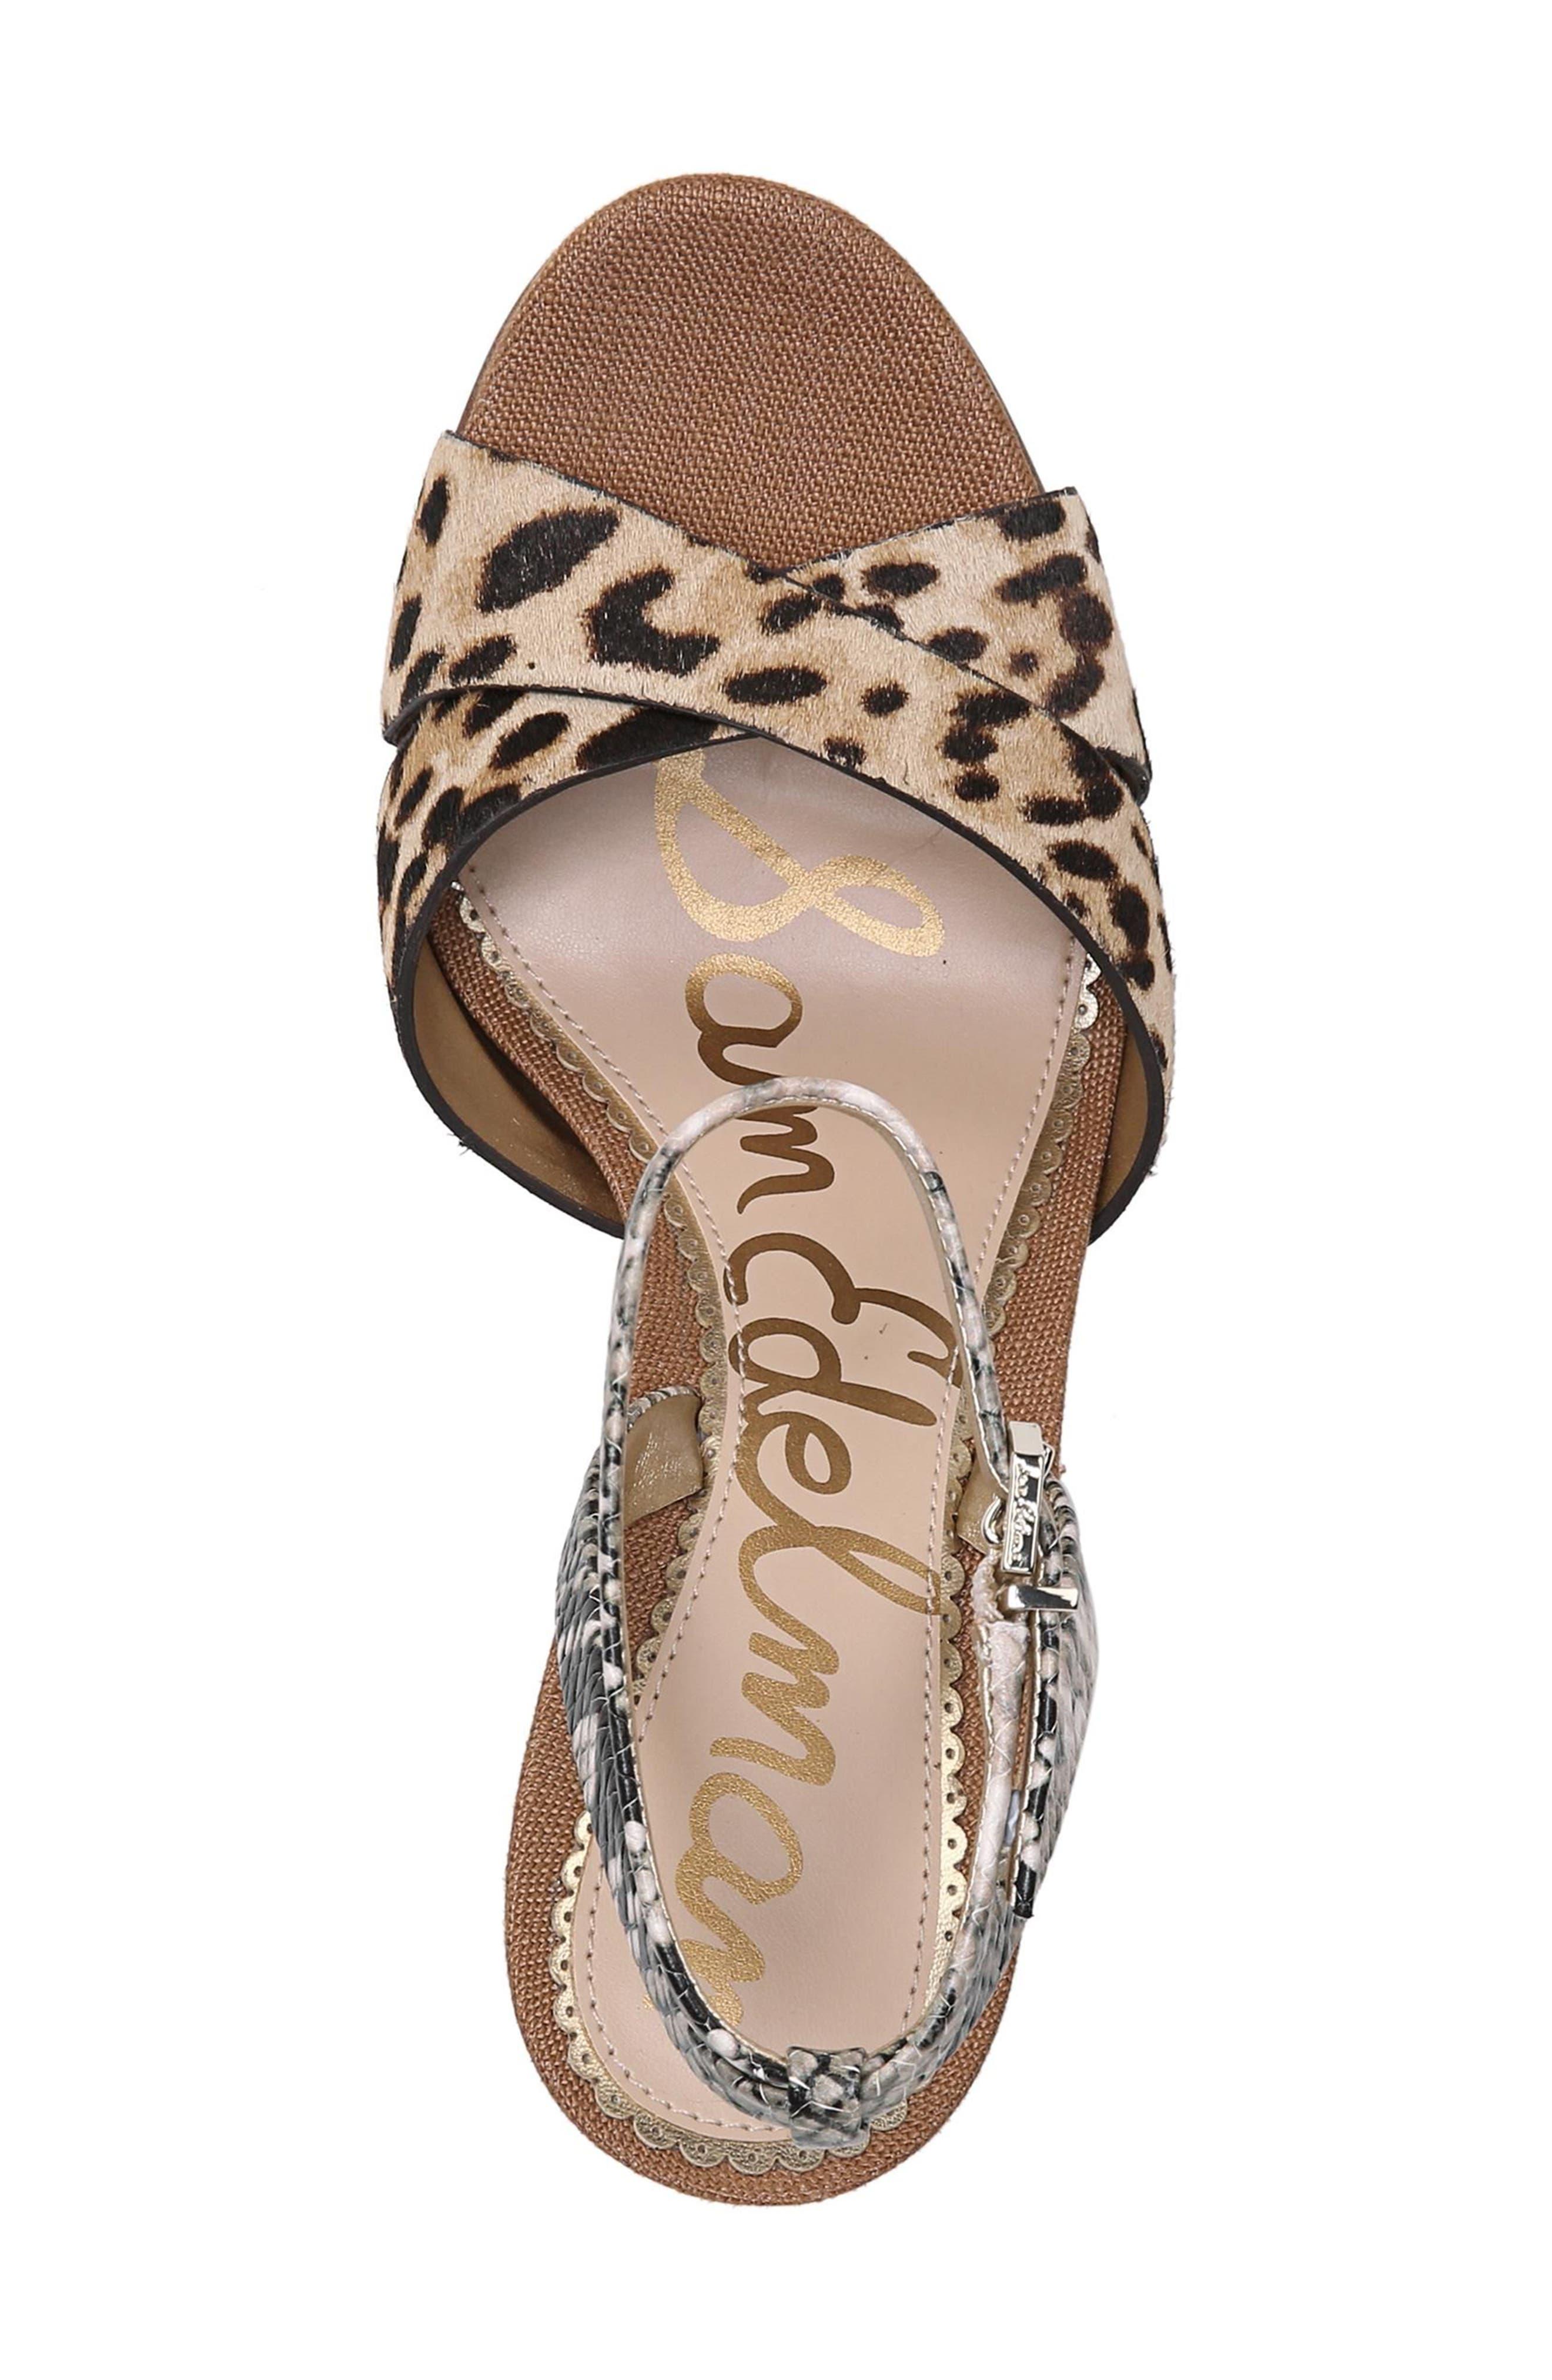 Aly Ankle Strap Sandal,                             Alternate thumbnail 5, color,                             Leopard Print Calf Hair